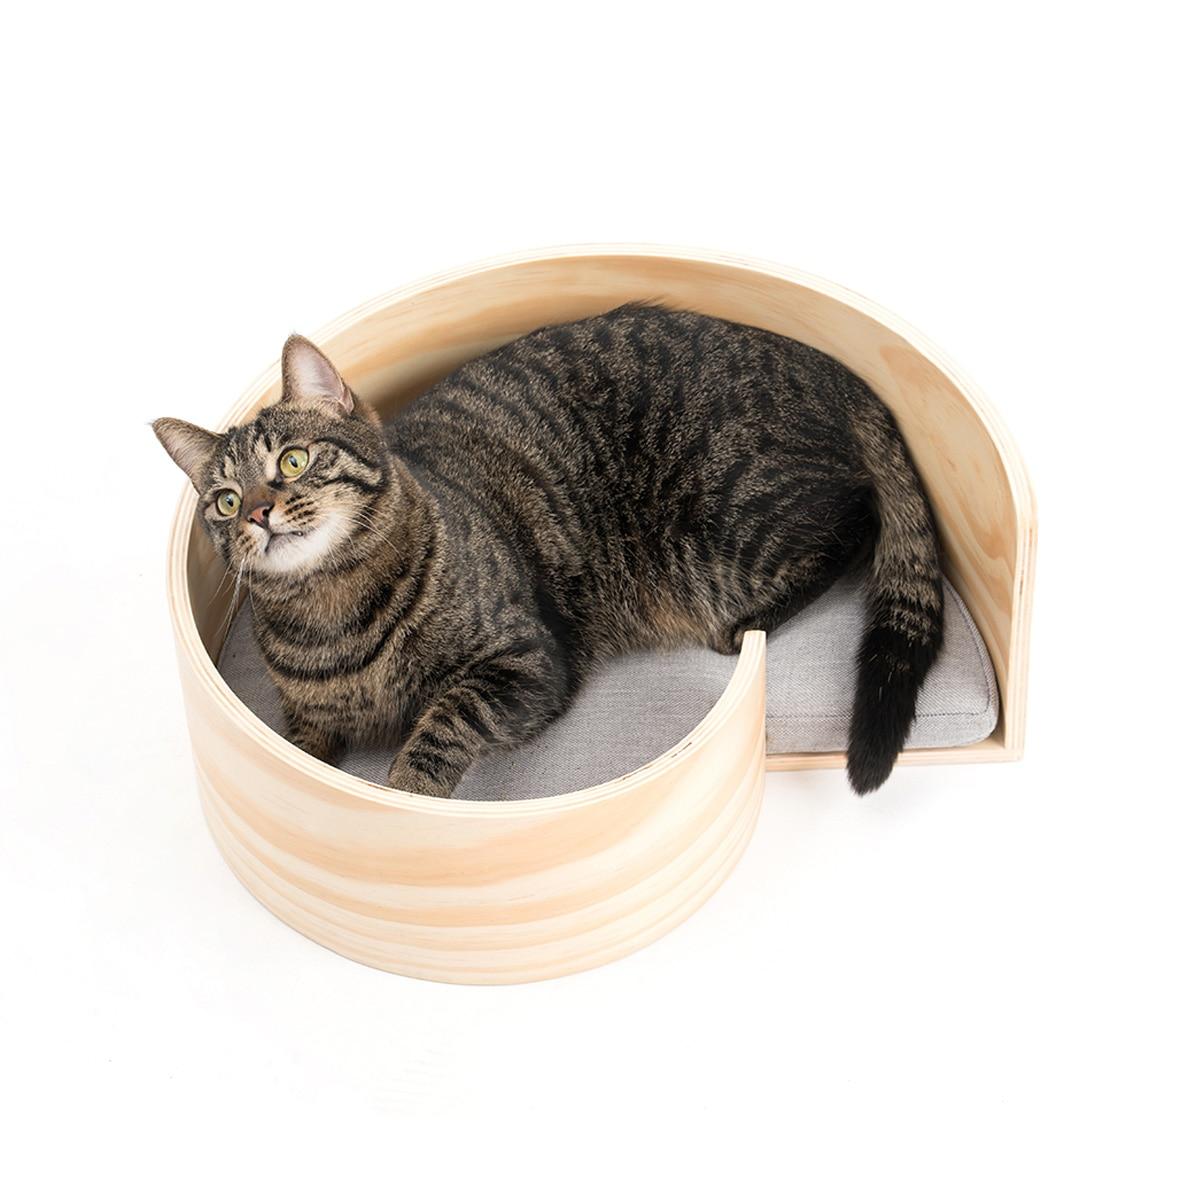 Wooden Cat Litter Pet Supplies  Bed Small House Dog Kennel Kedi Evi Blanket Beds